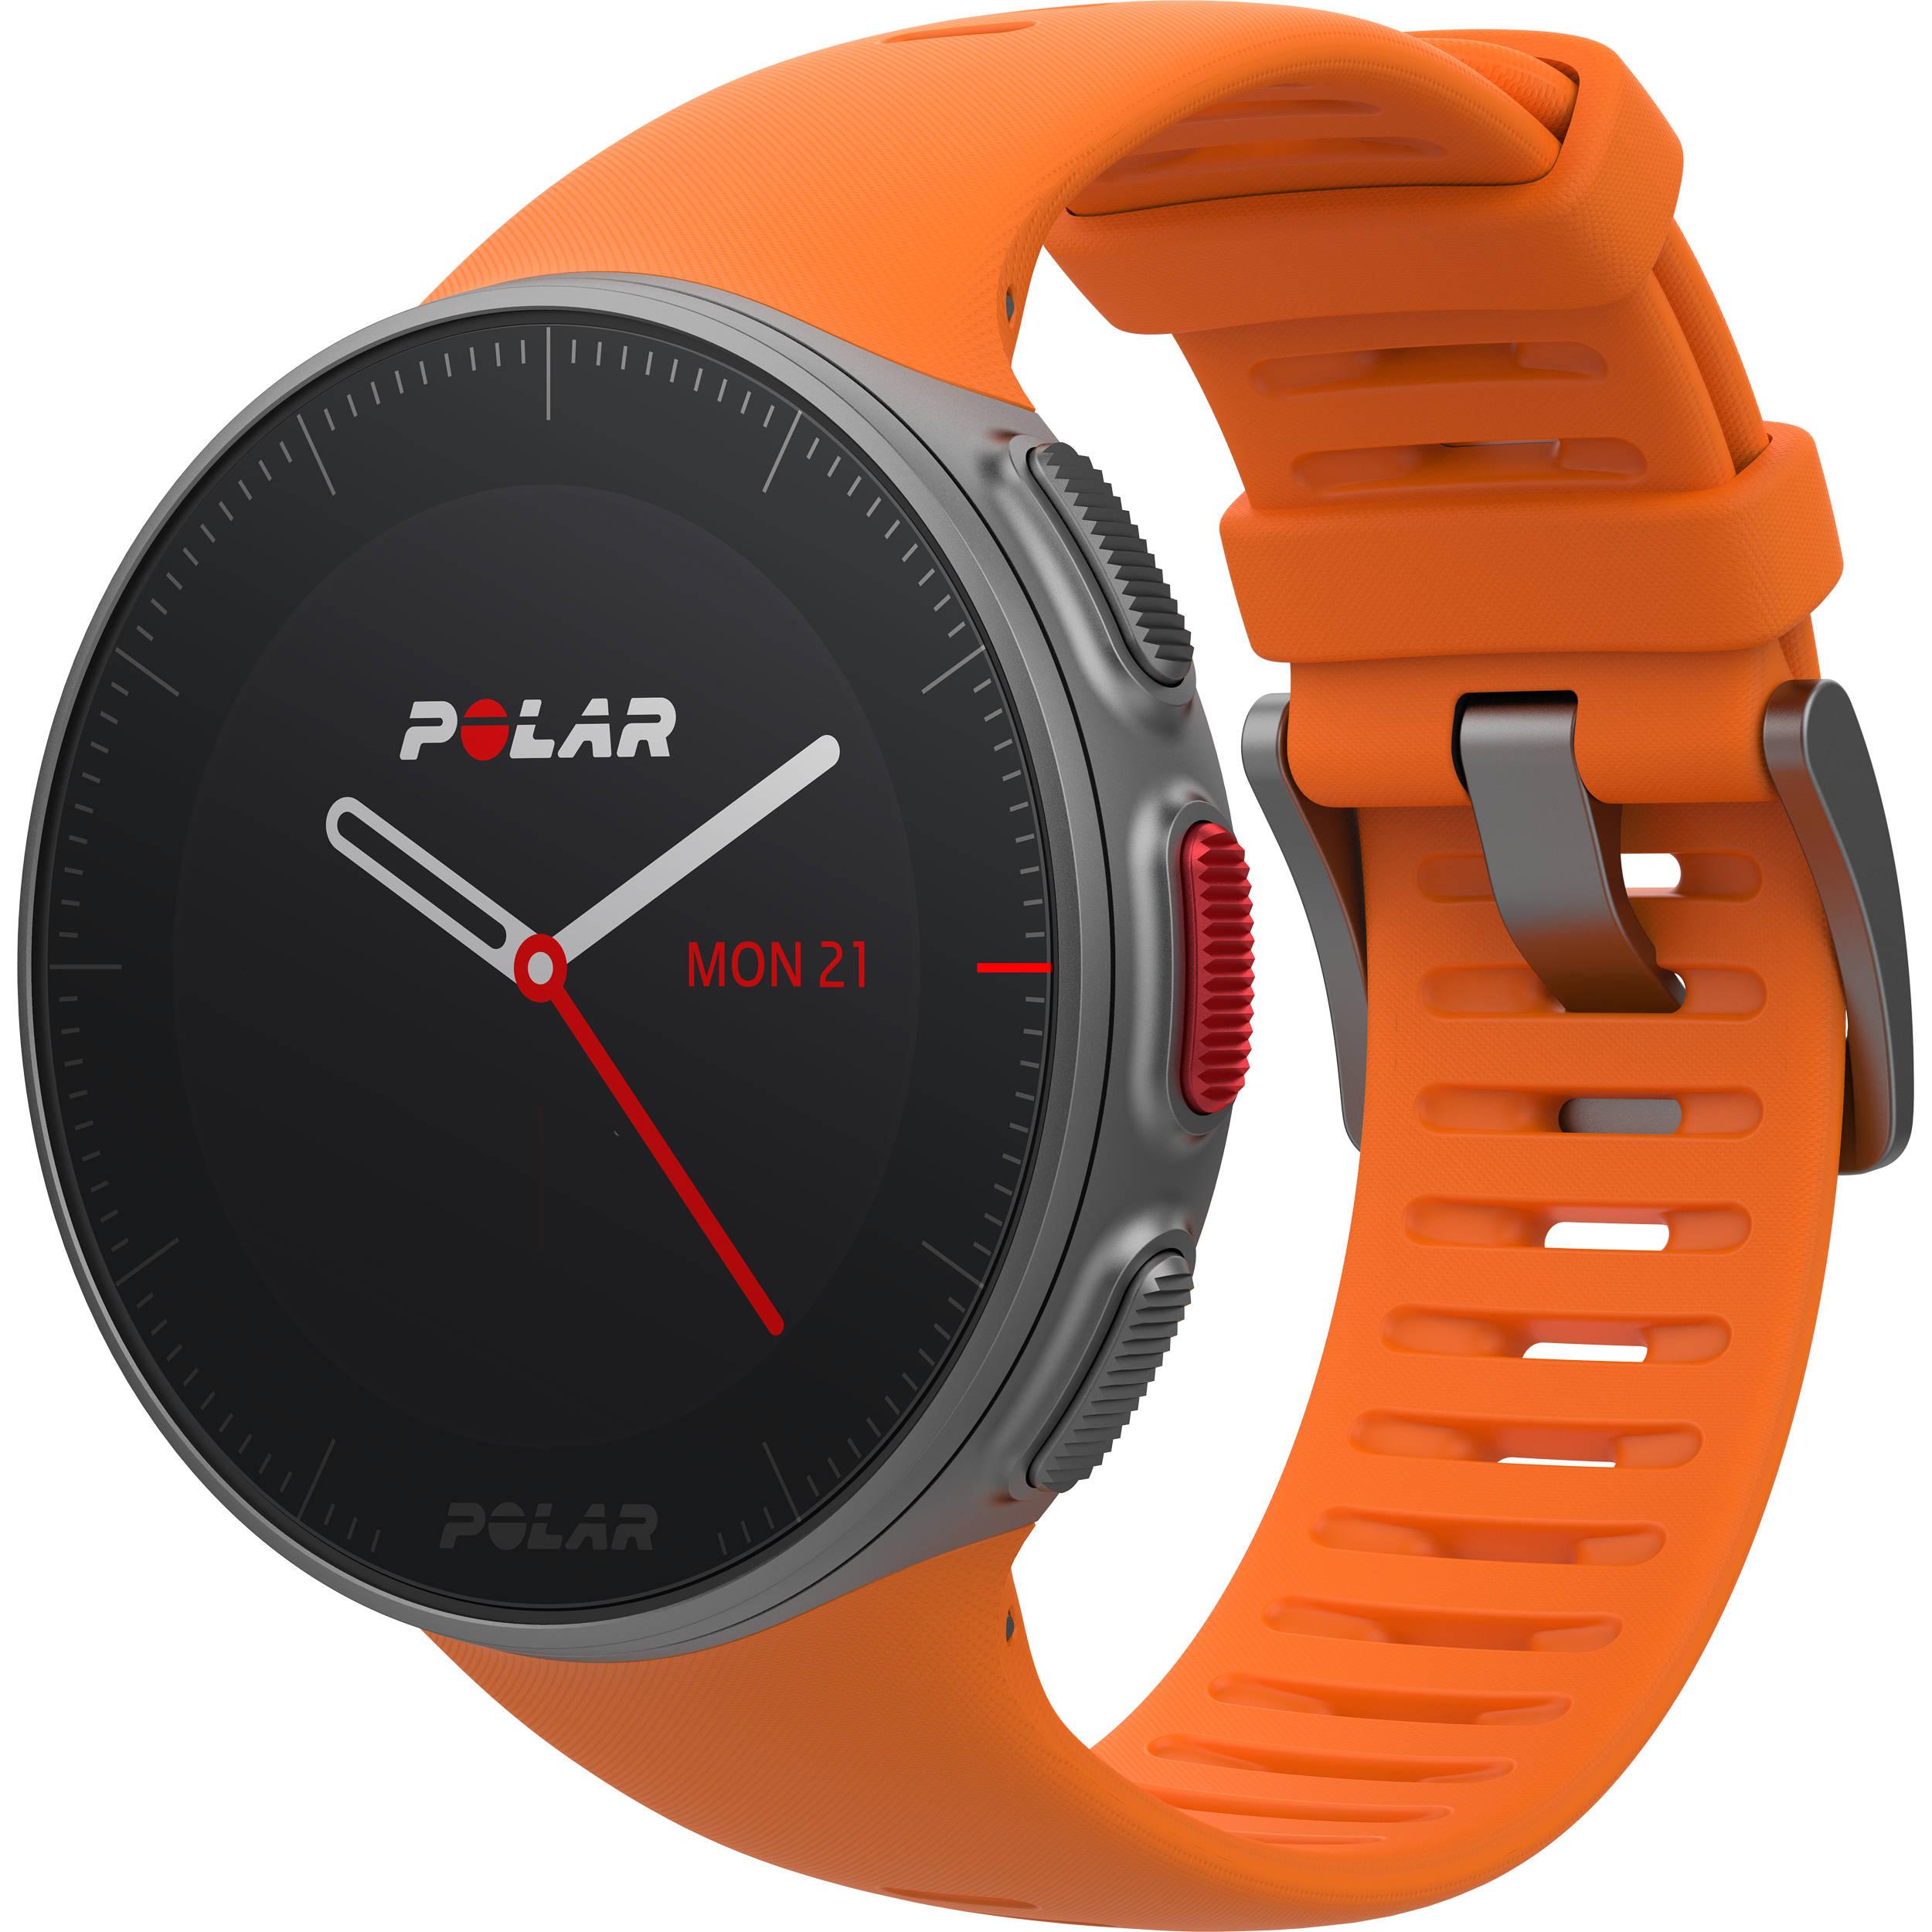 fc505d9ef Polar Vantage V Multisport/Triathlon GPS Watch with H10 Heart Rate Sensor  (M/